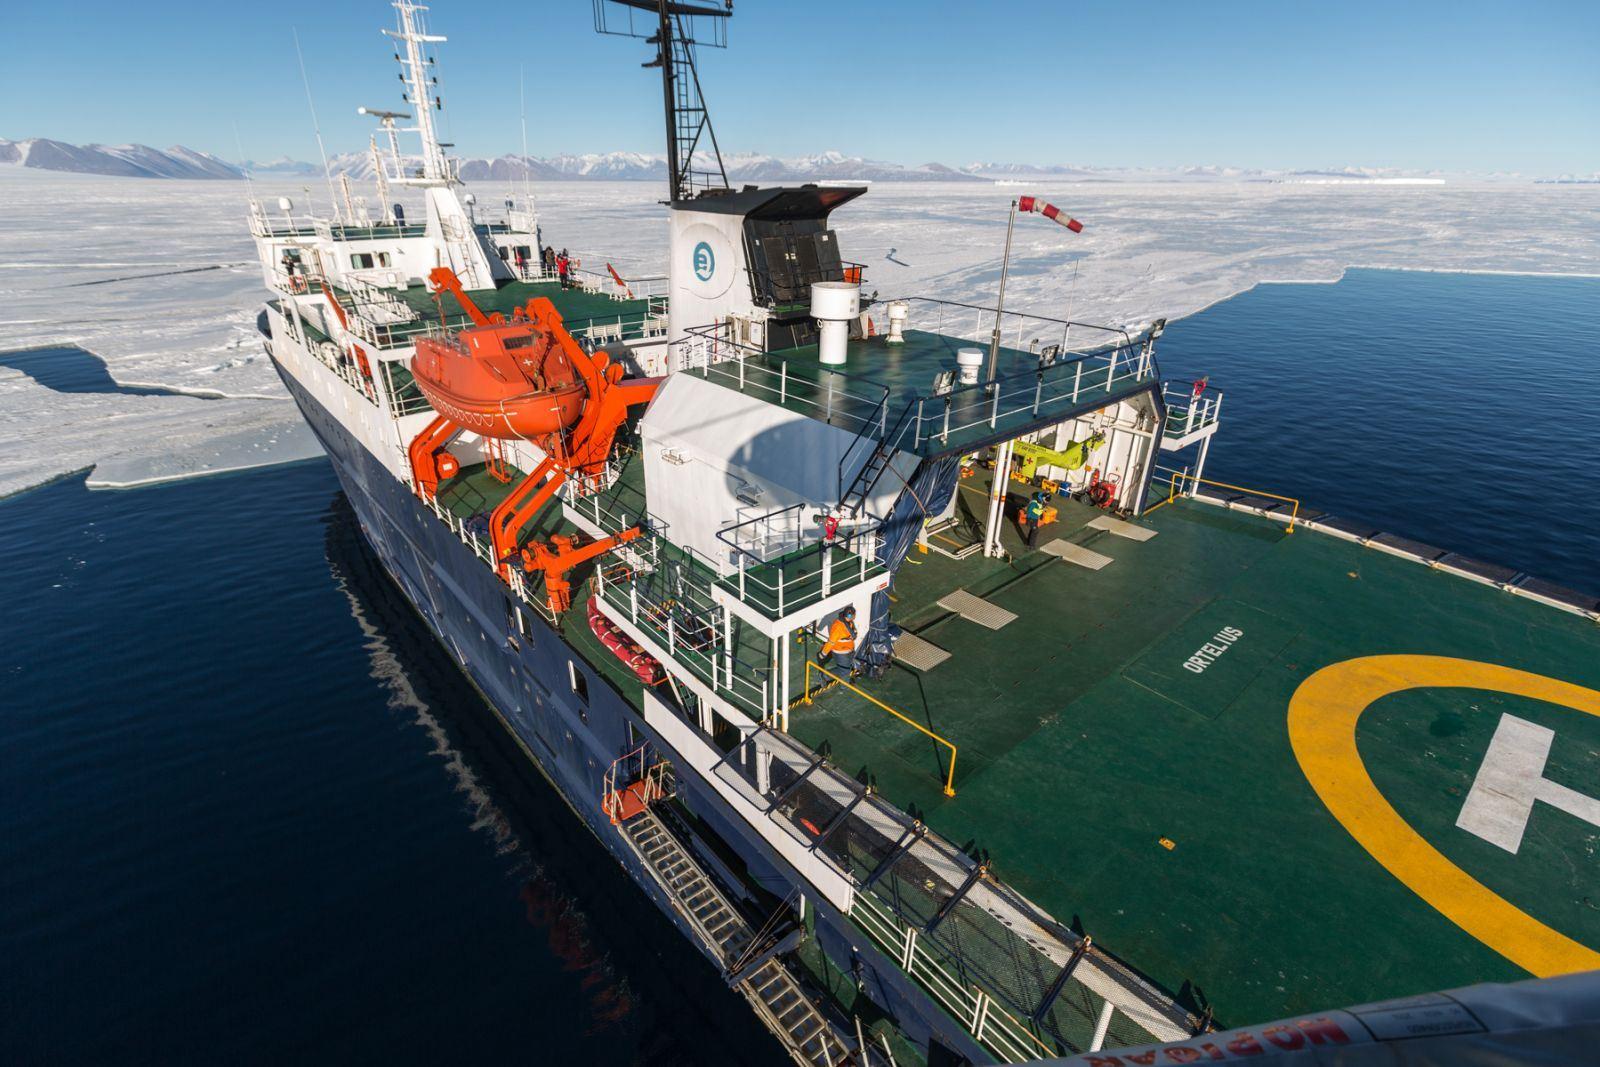 Antarctic Peninsula & South Shetlands Islands Cruise